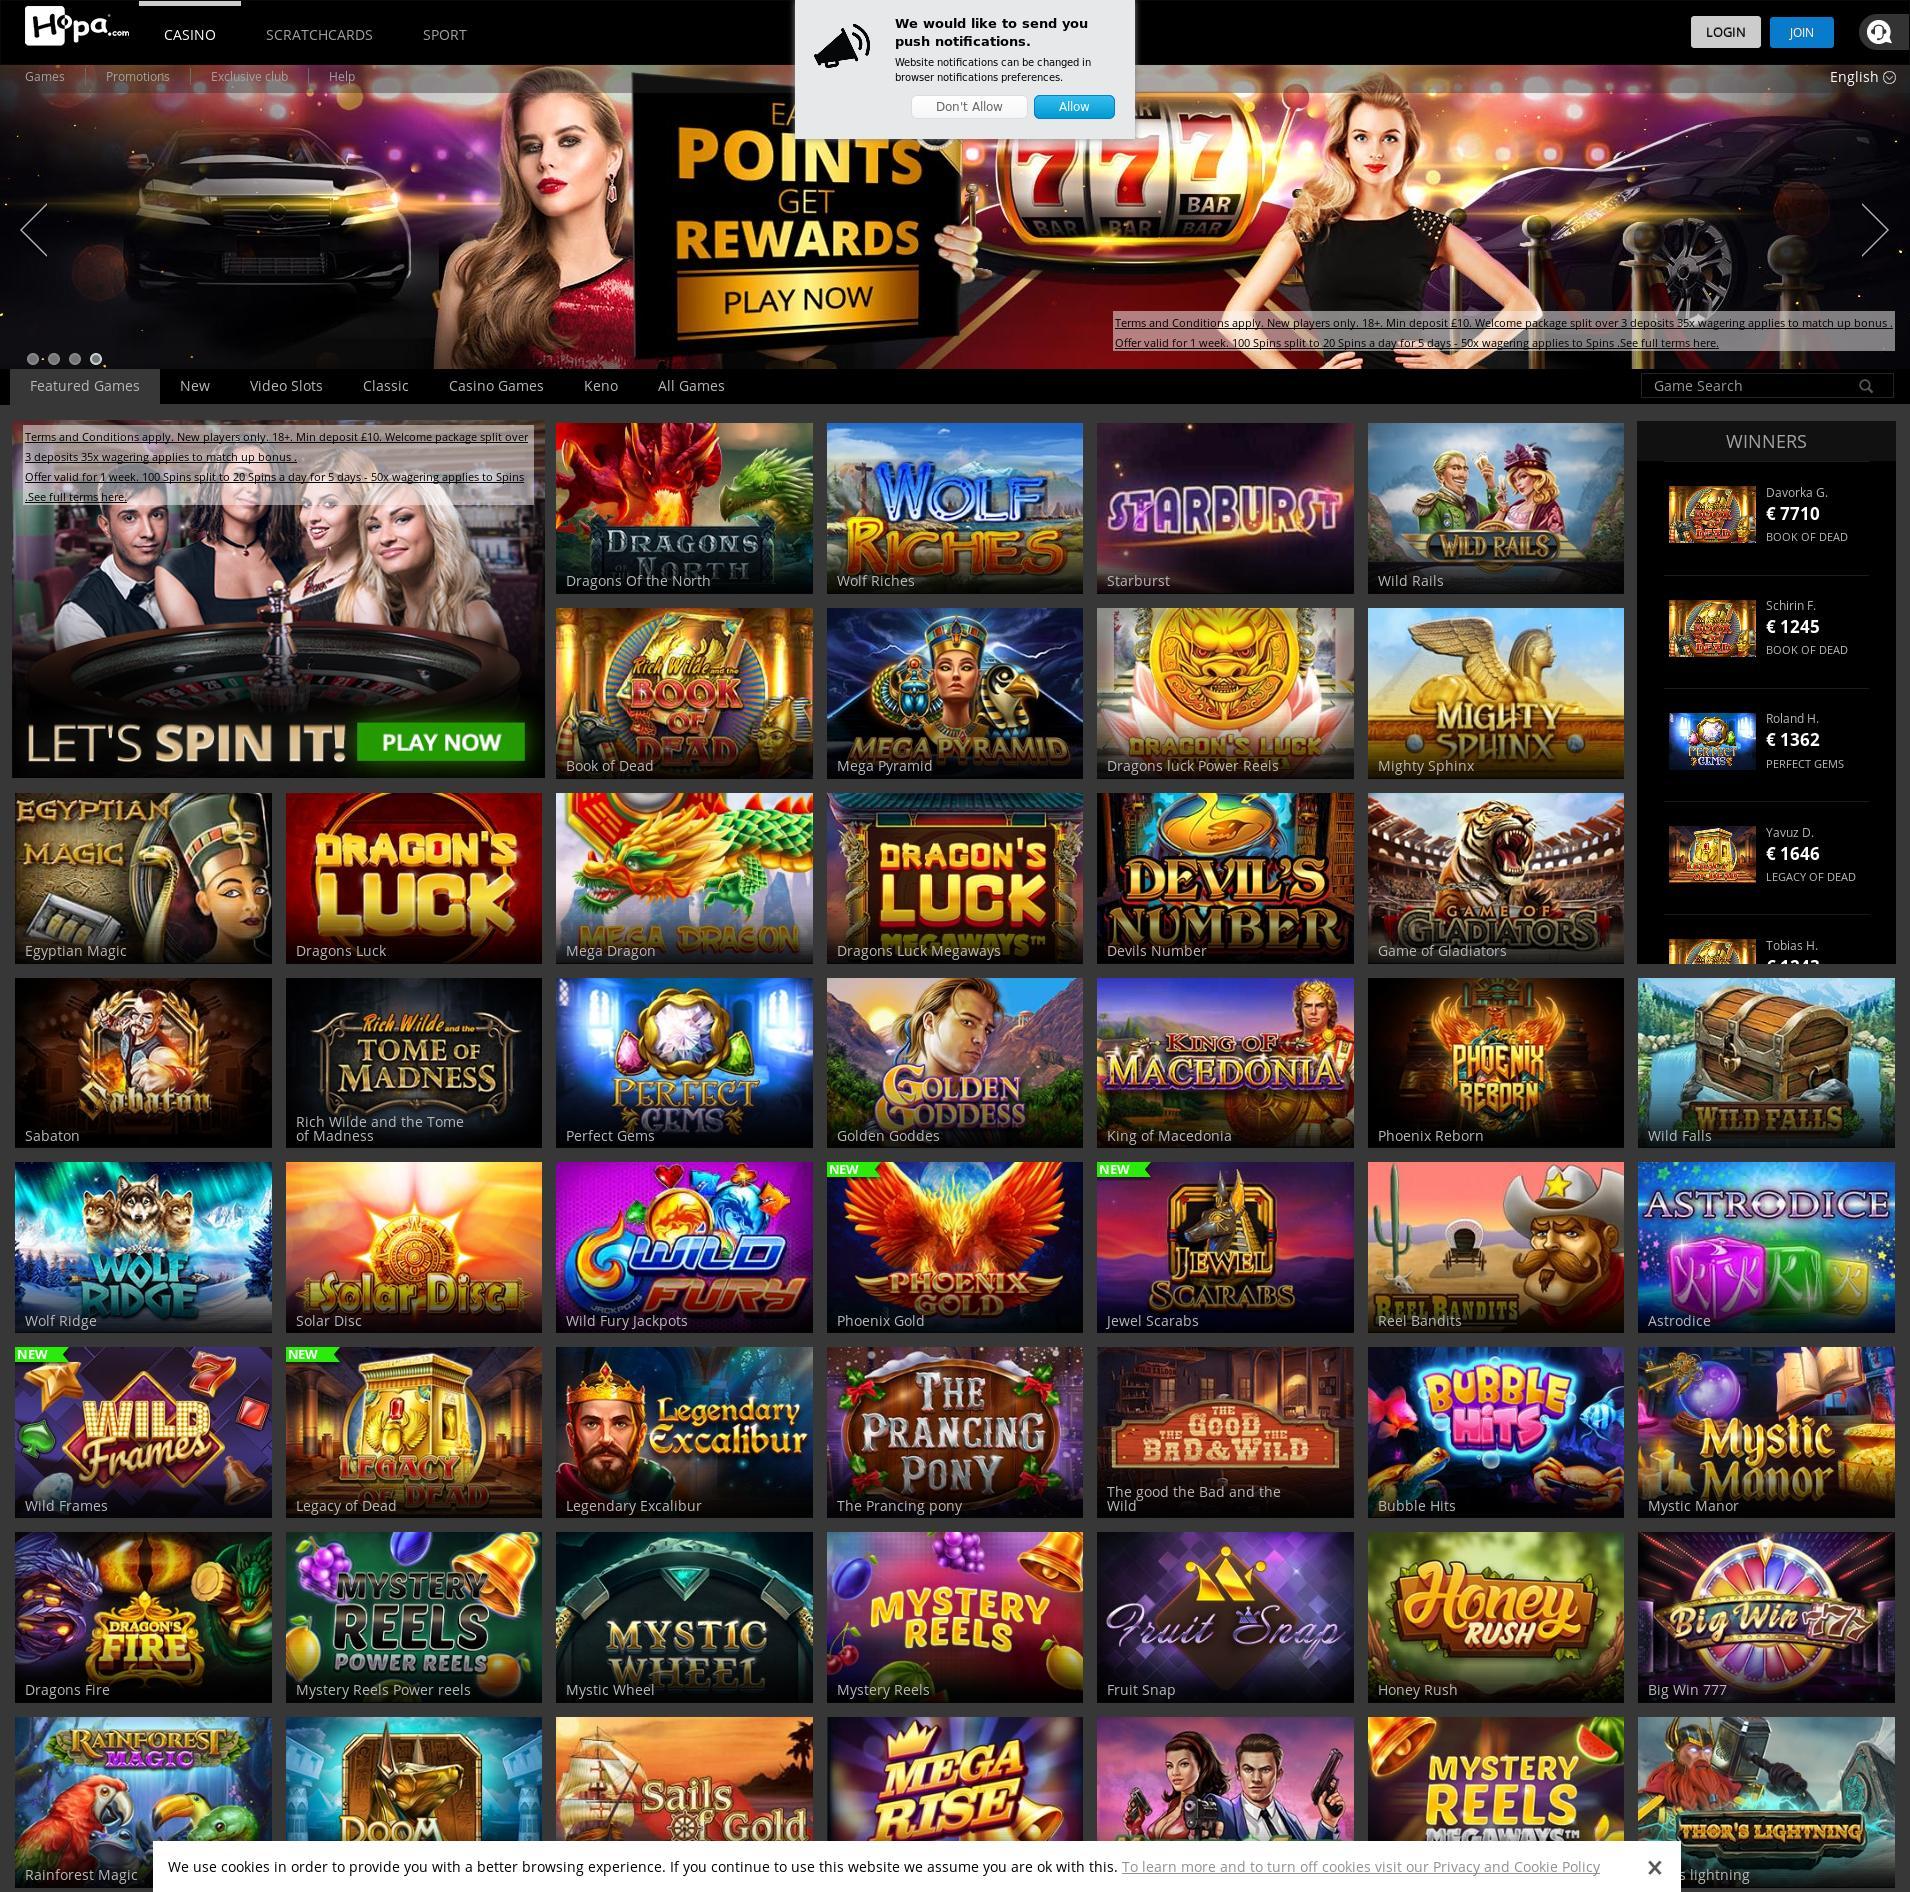 Casino screen Lobby 2020-01-23 for United Kingdom